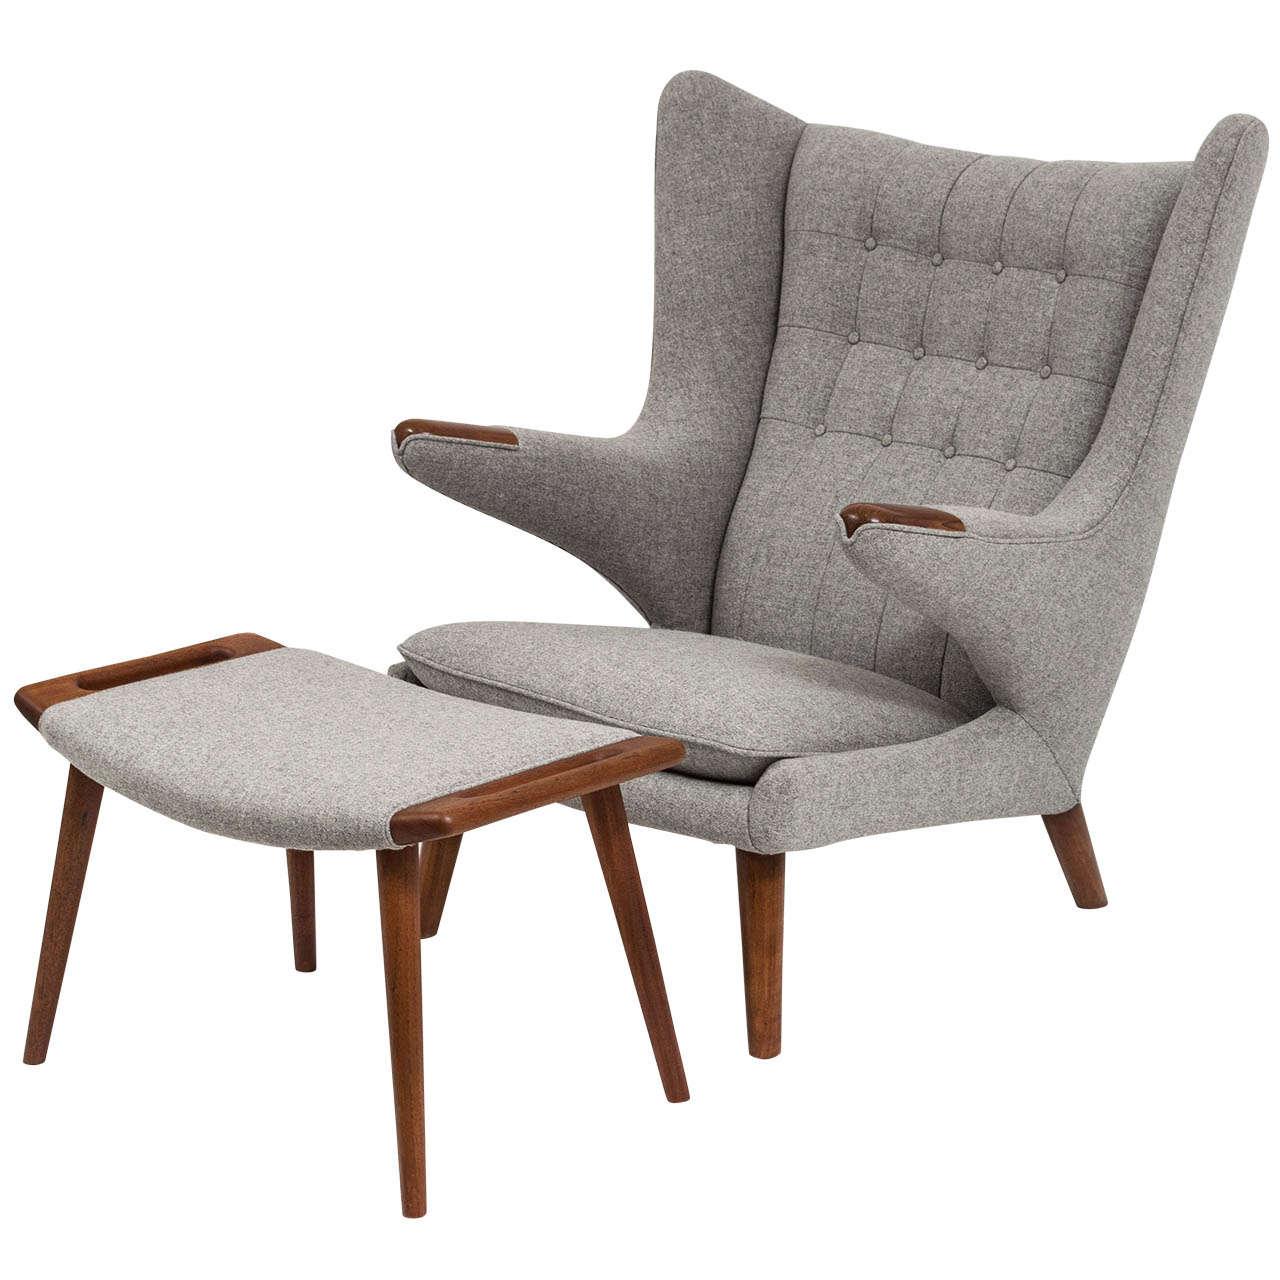 papa bear chair beautiful accent chairs hans j wegner and ottoman at 1stdibs